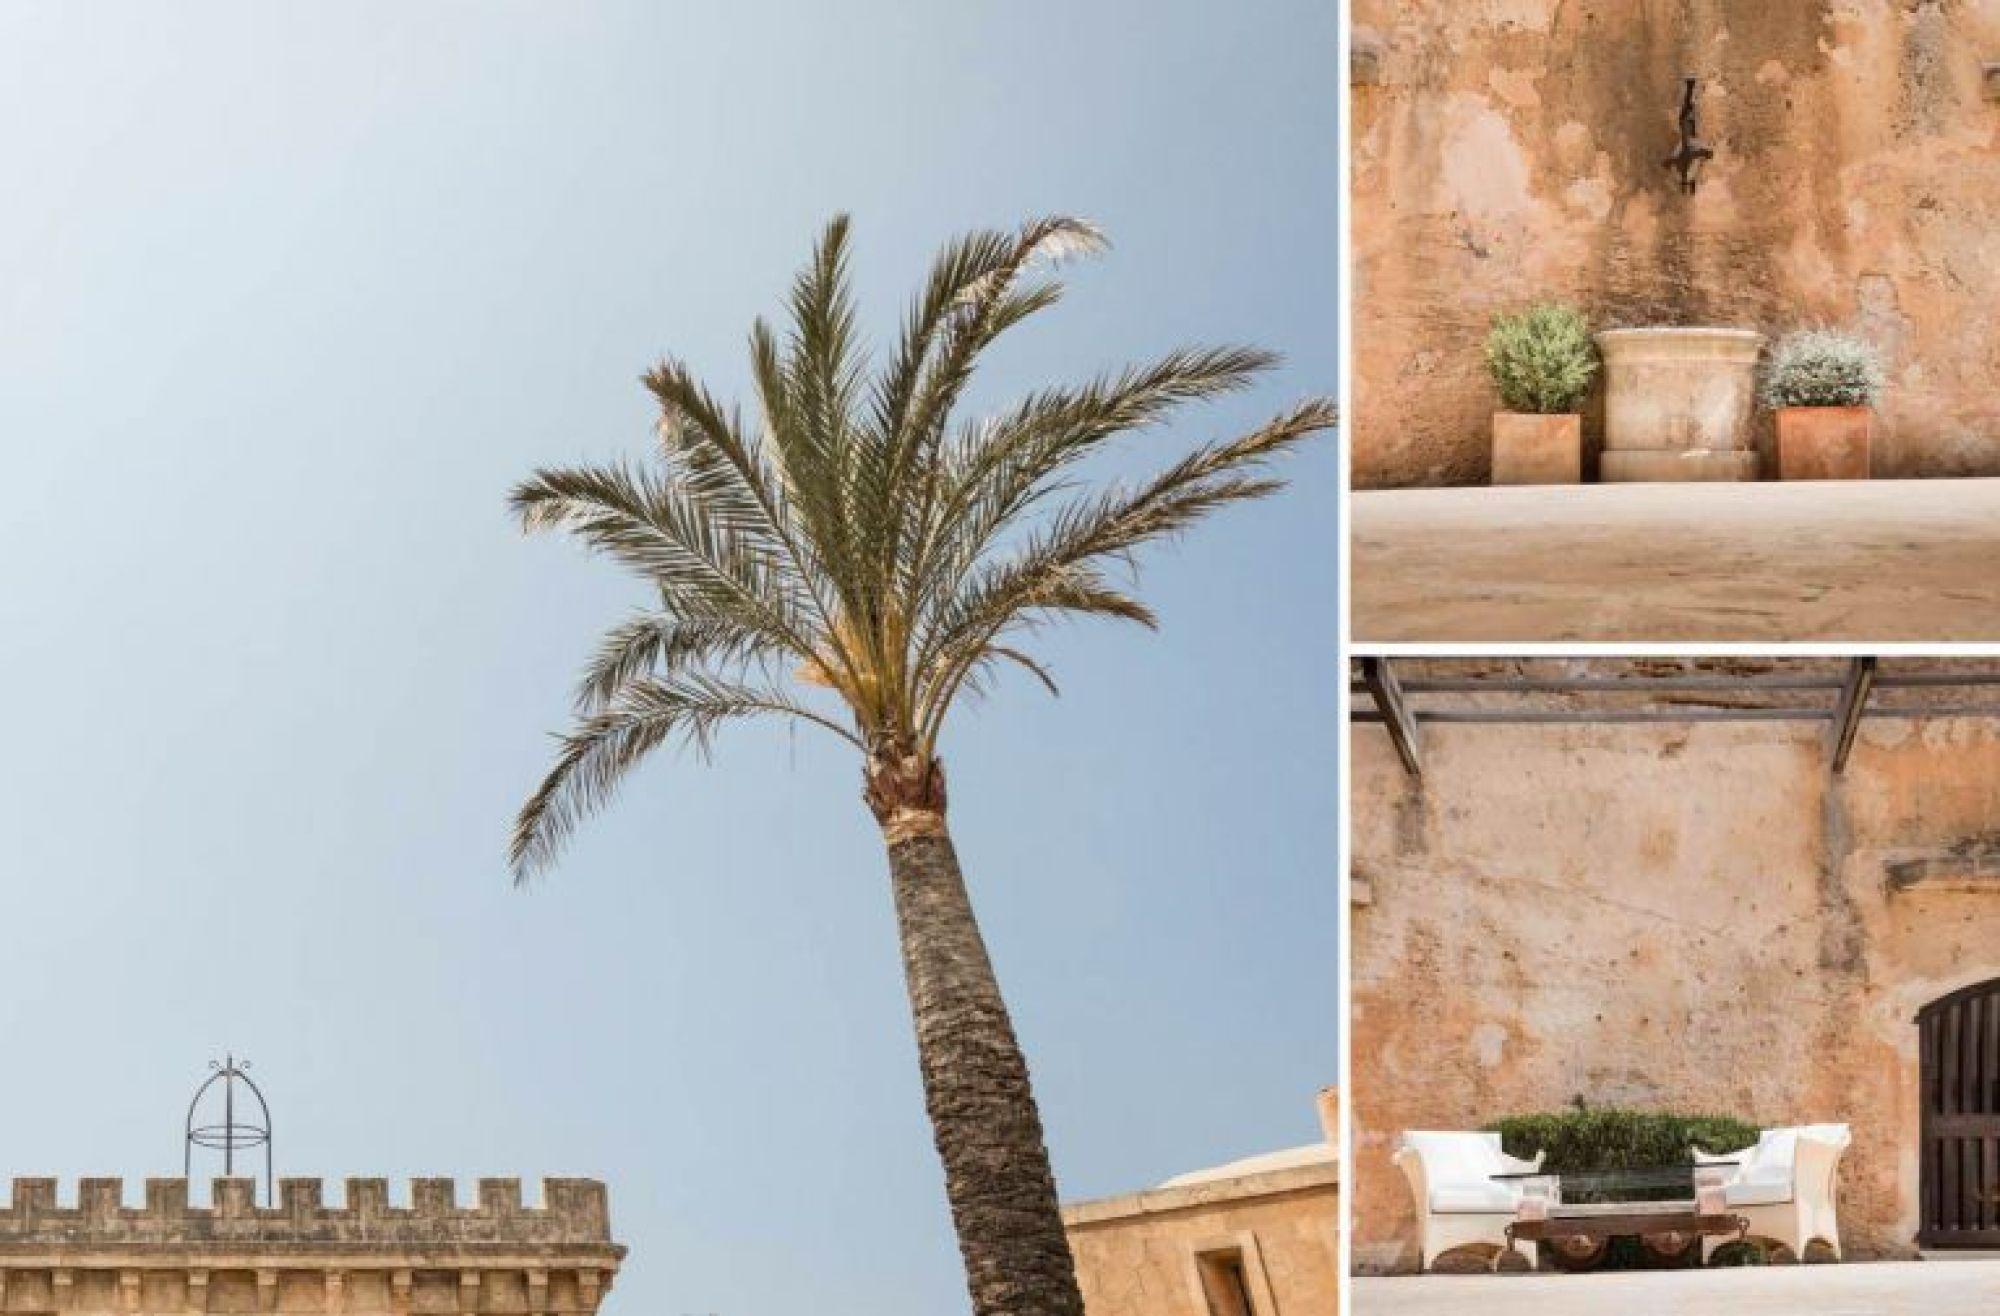 A few scenes at Cap Rocat hotel in Mallorca